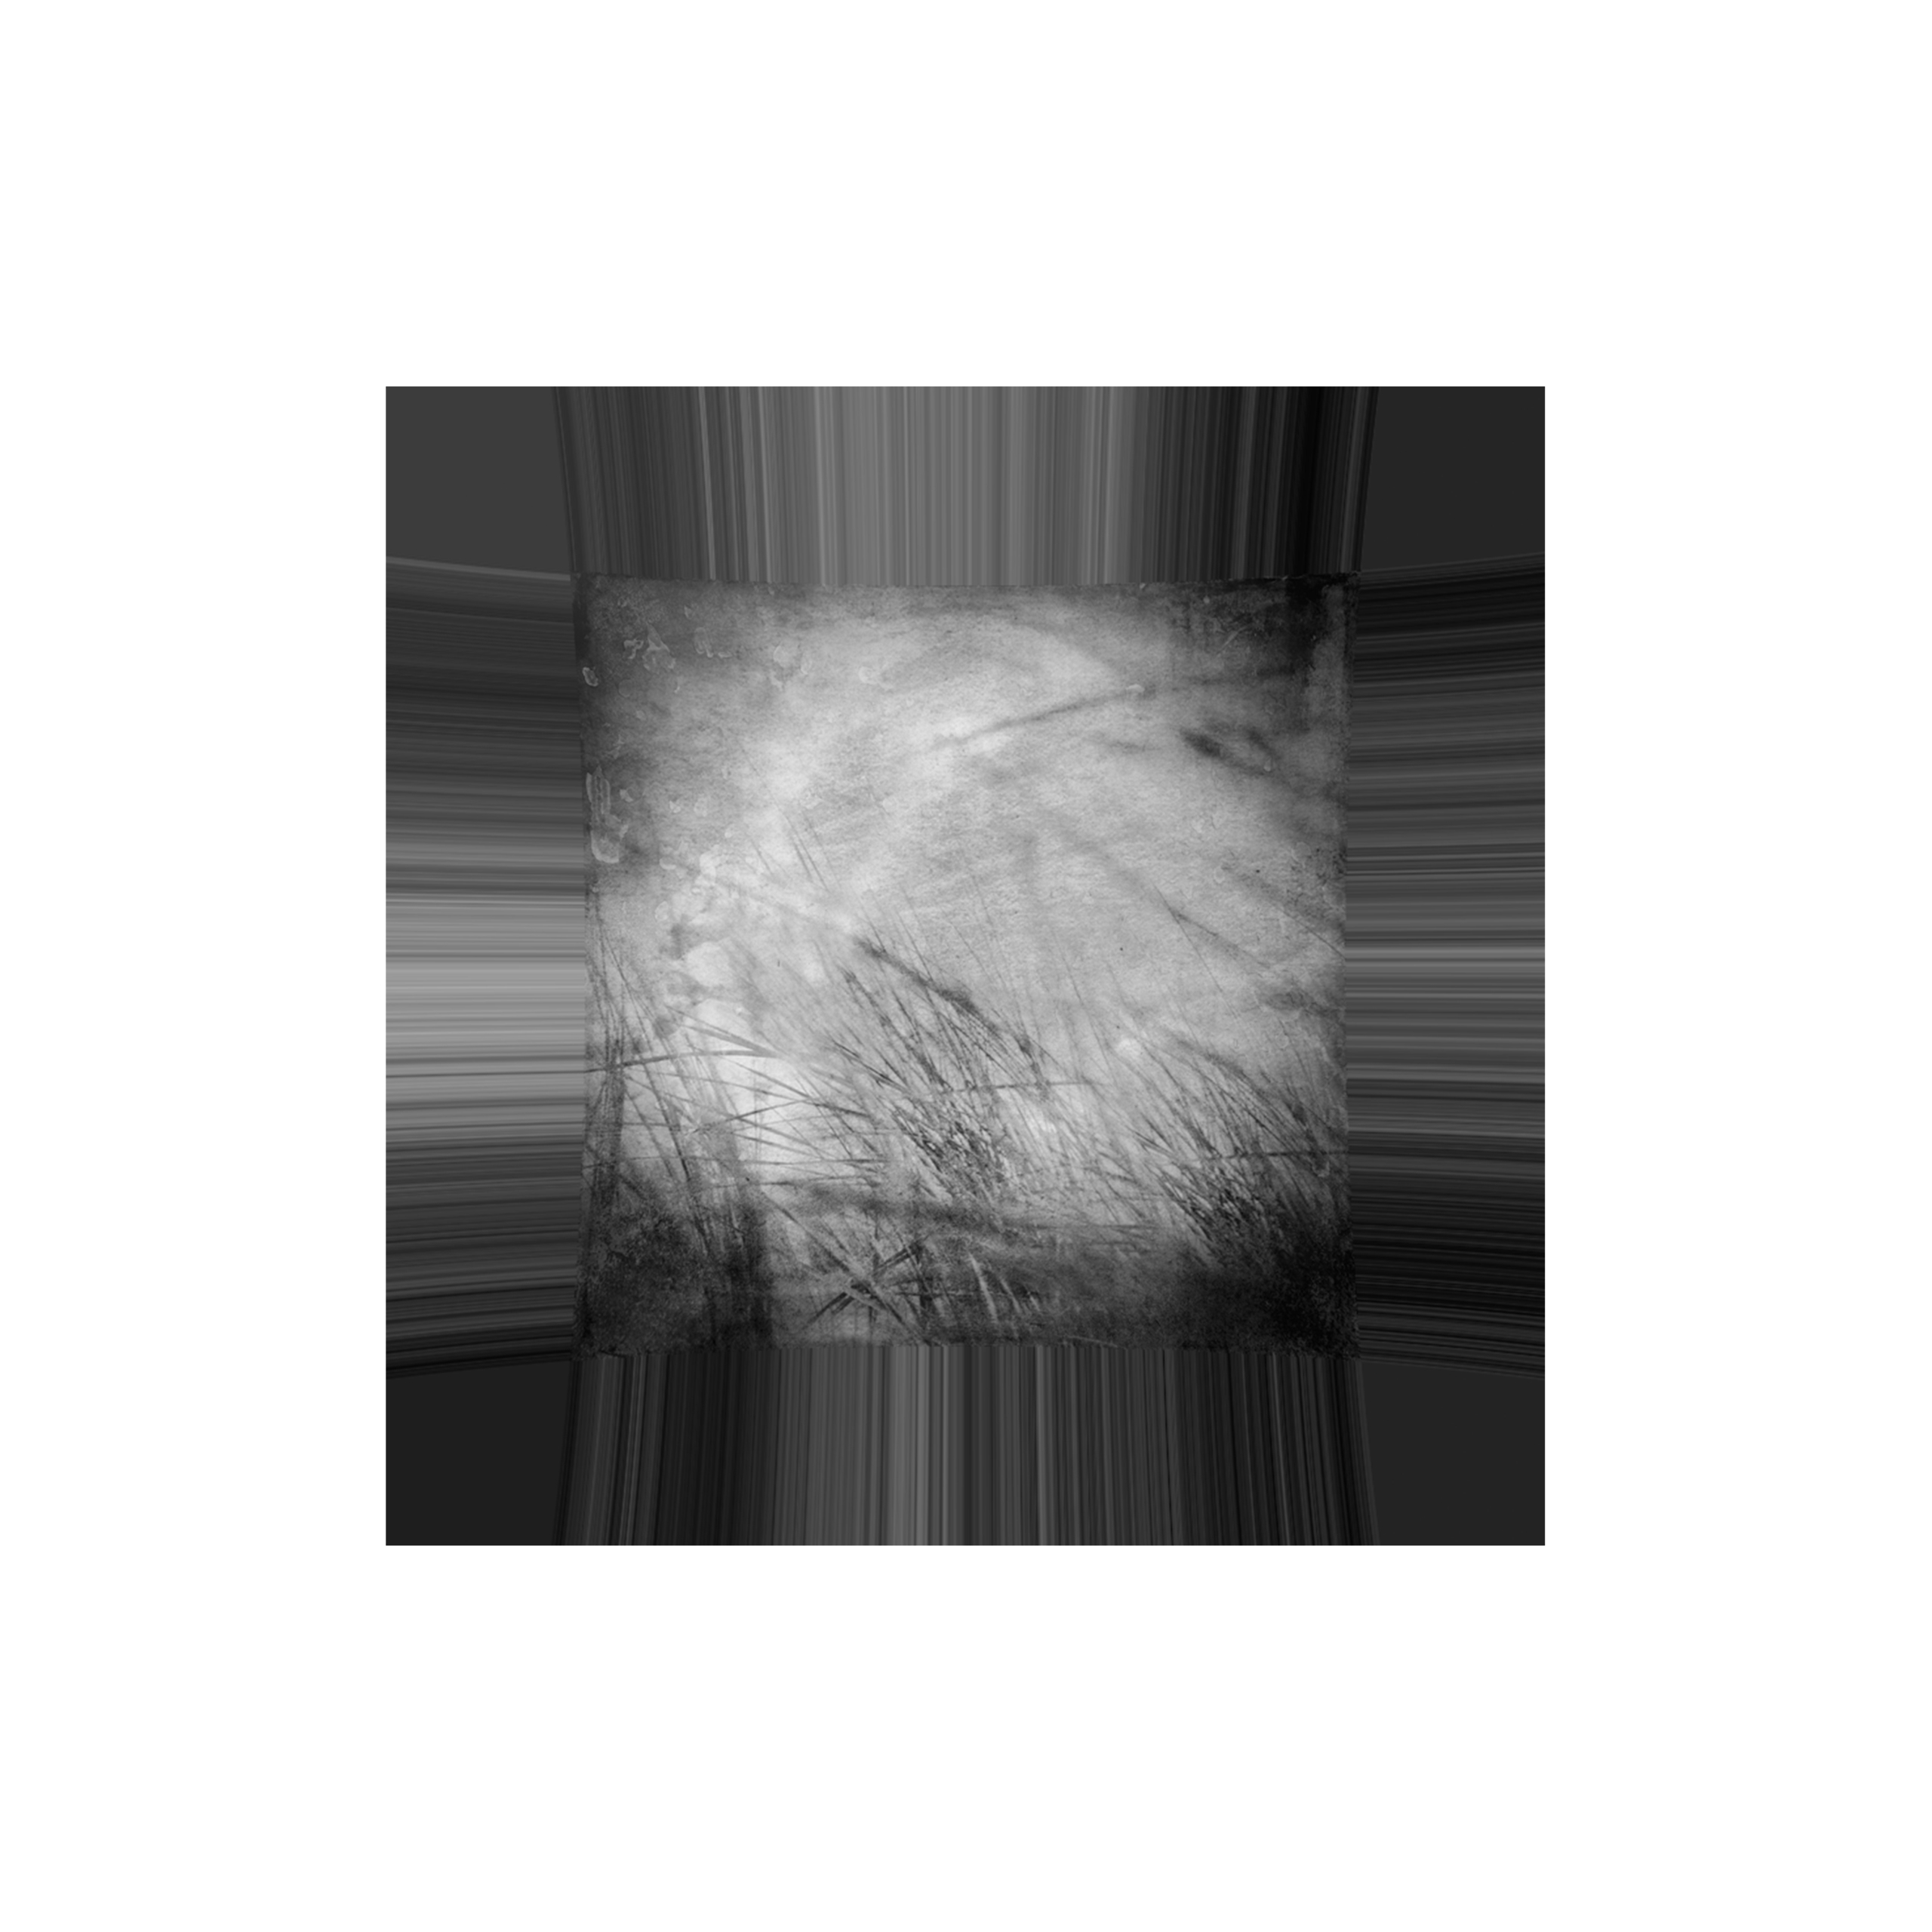 Experiment - monique2211 | ello